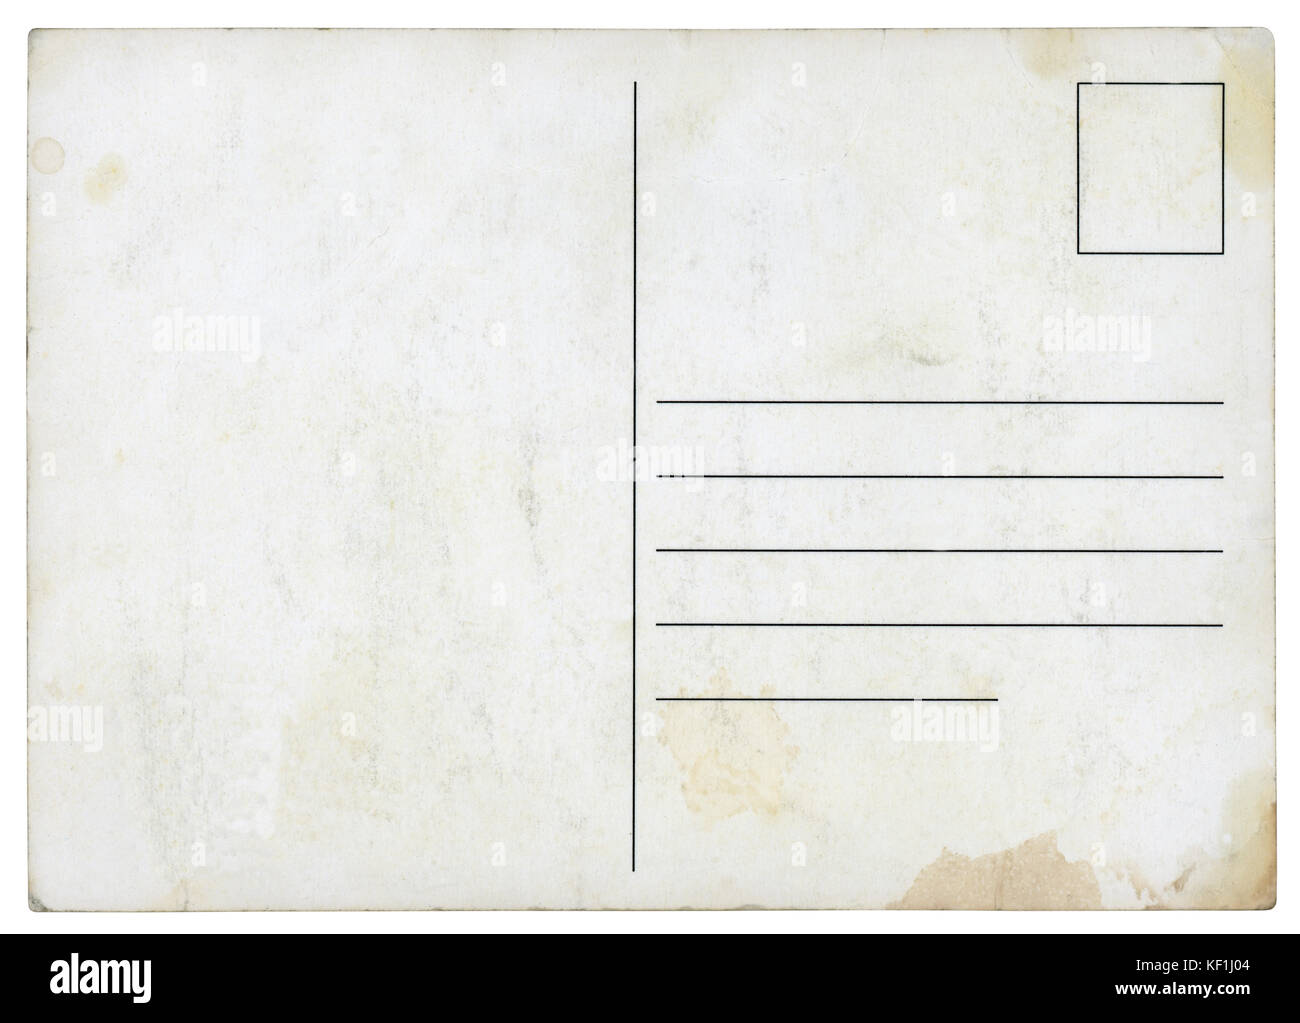 Carte postale ancienne - isolé (chemin inclus) Photo Stock